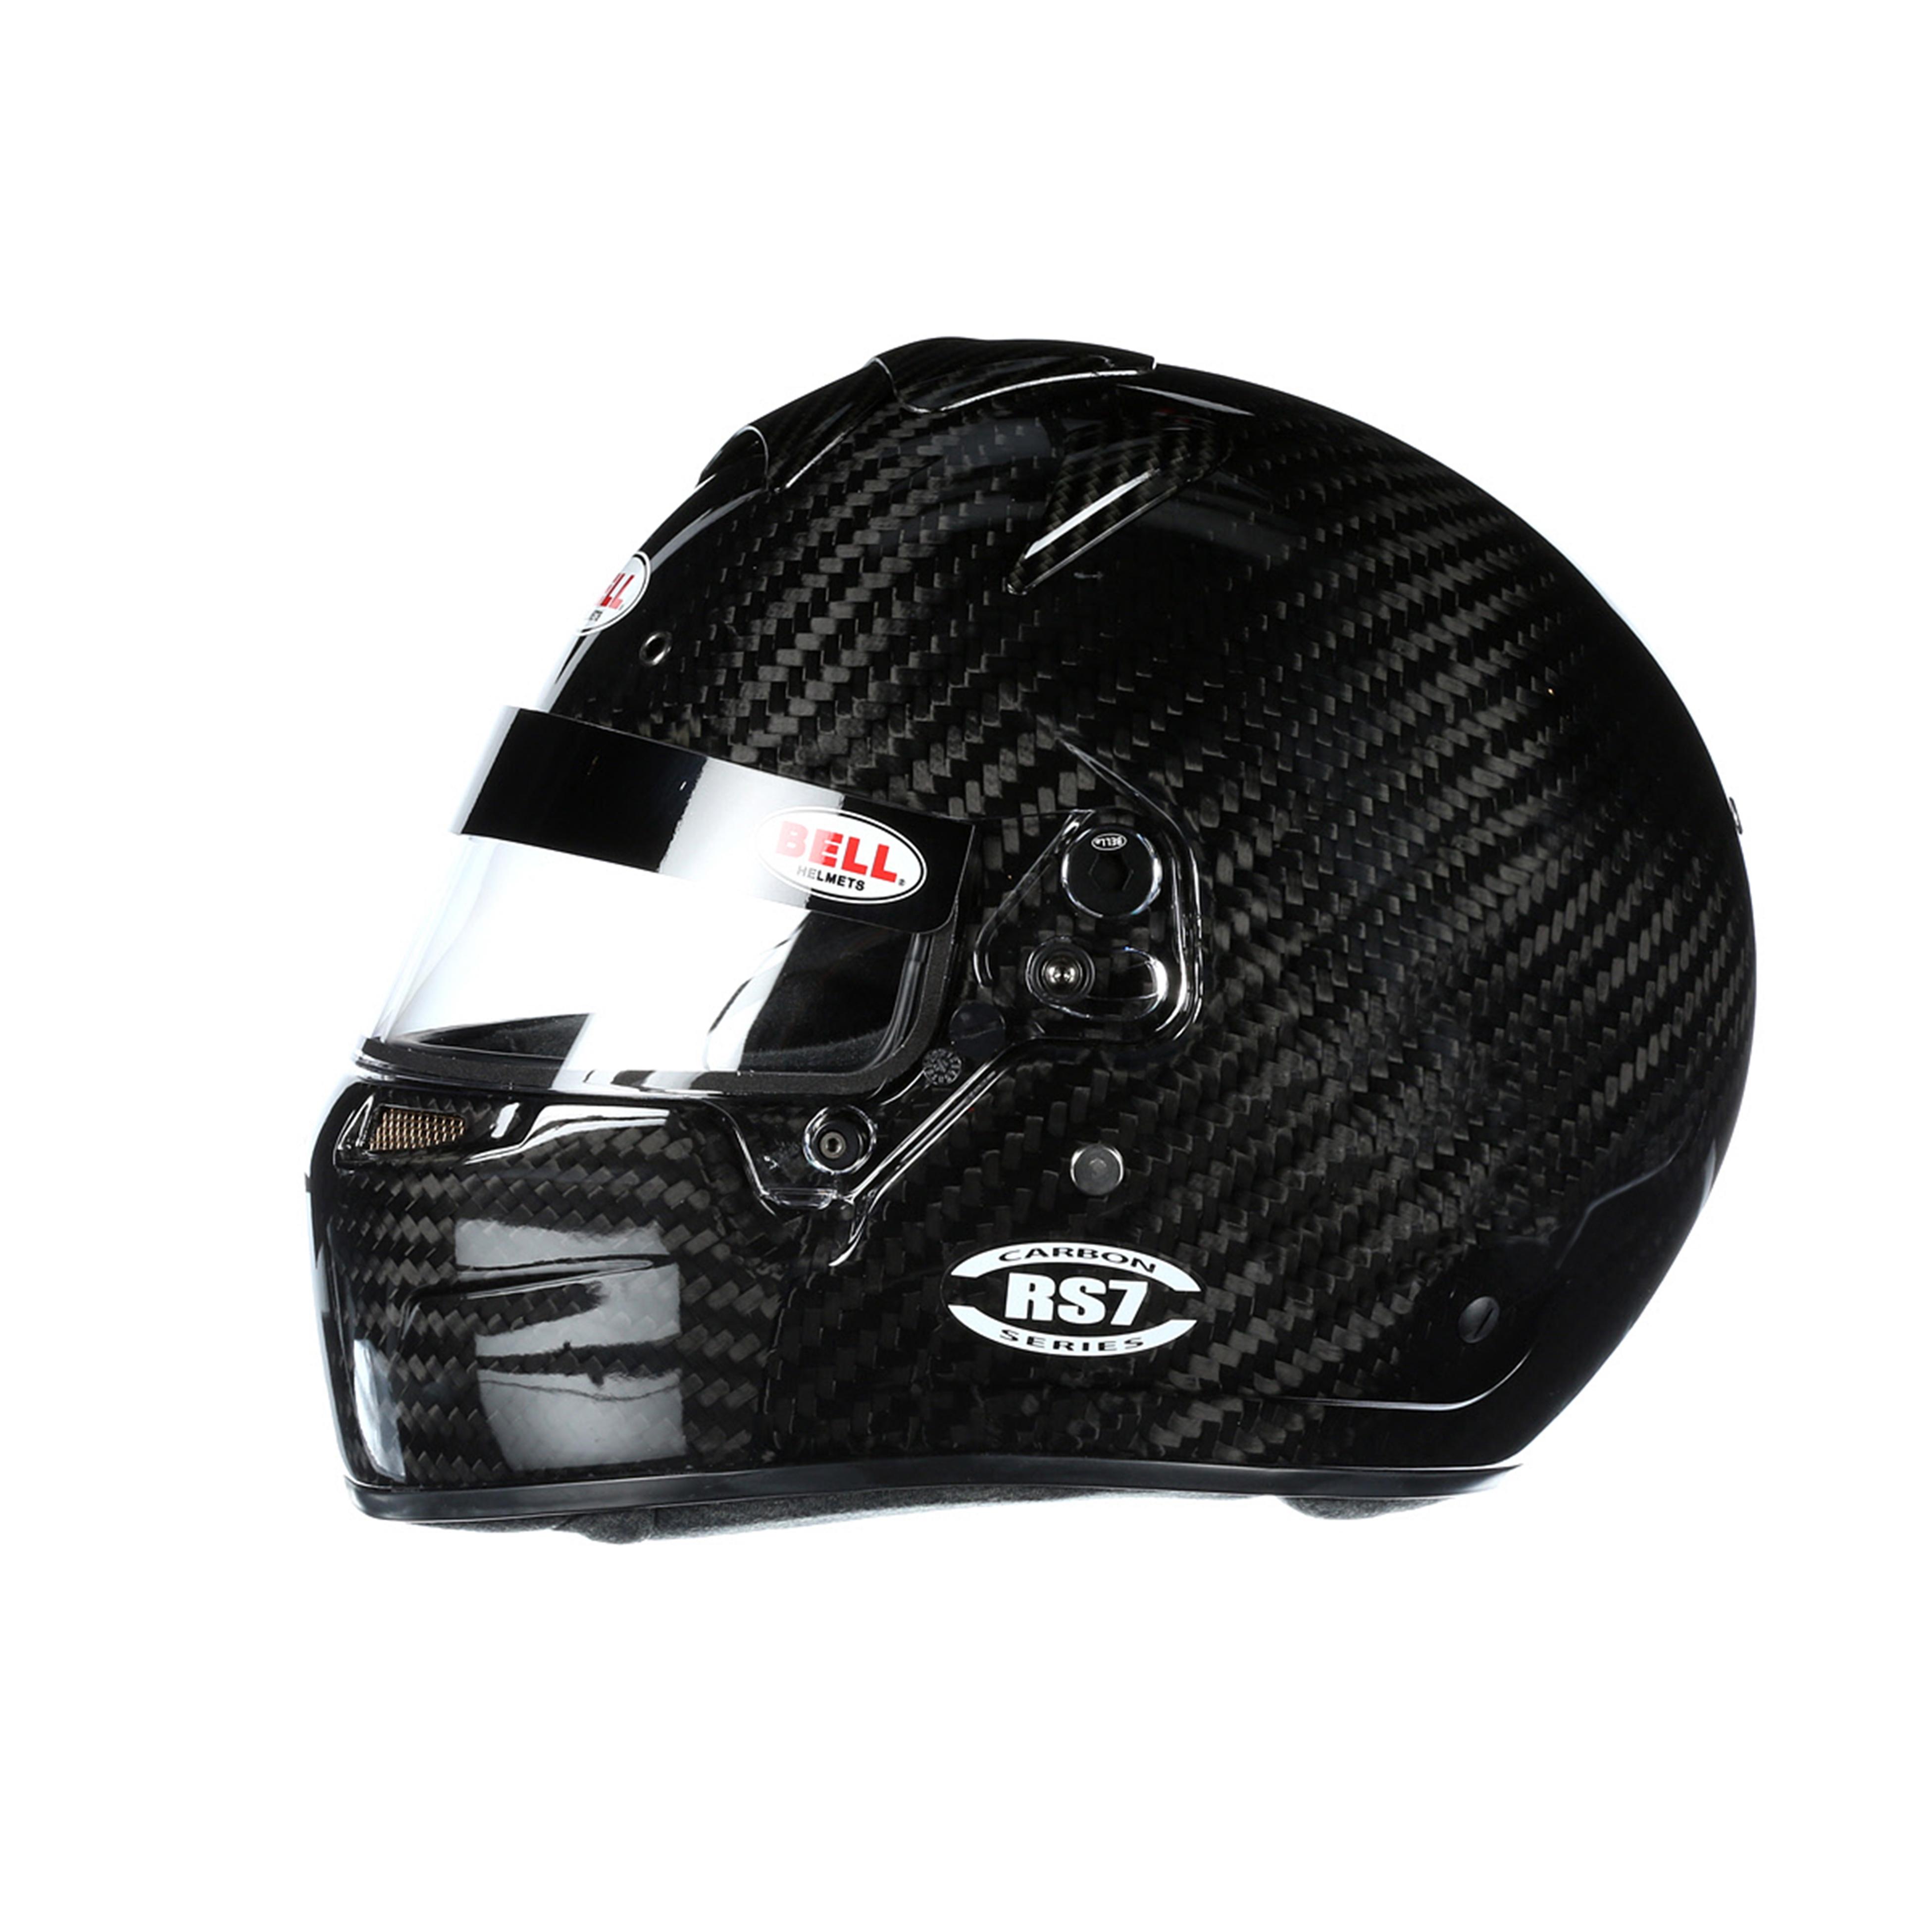 cfa42b98 Bell RS7 Helmets - JOES Racing Products